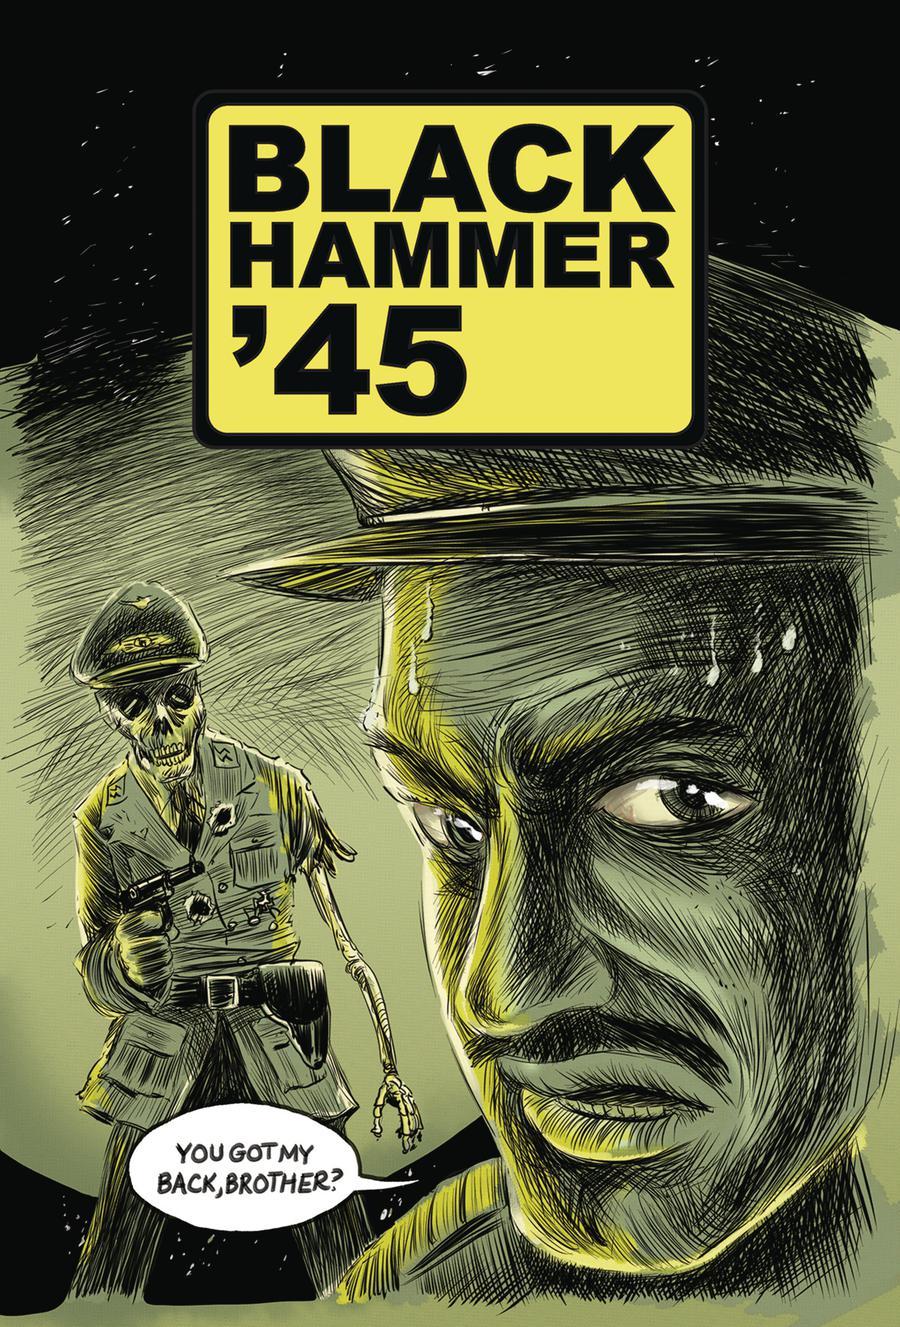 Black Hammer 45 From The World Of Black Hammer #4 Cover A Regular Matt Kindt Cover